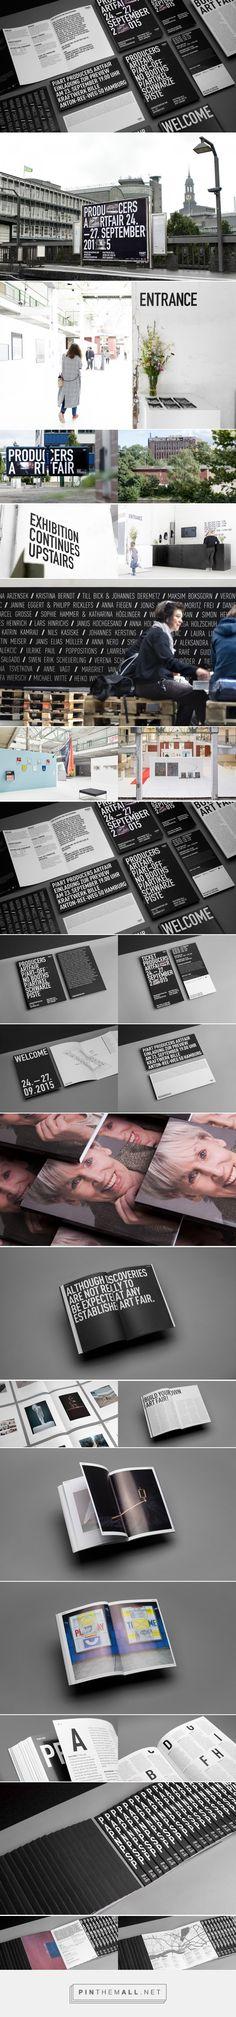 P/ART producers artfair - corporate design on Behance - created via https://pinthemall.net